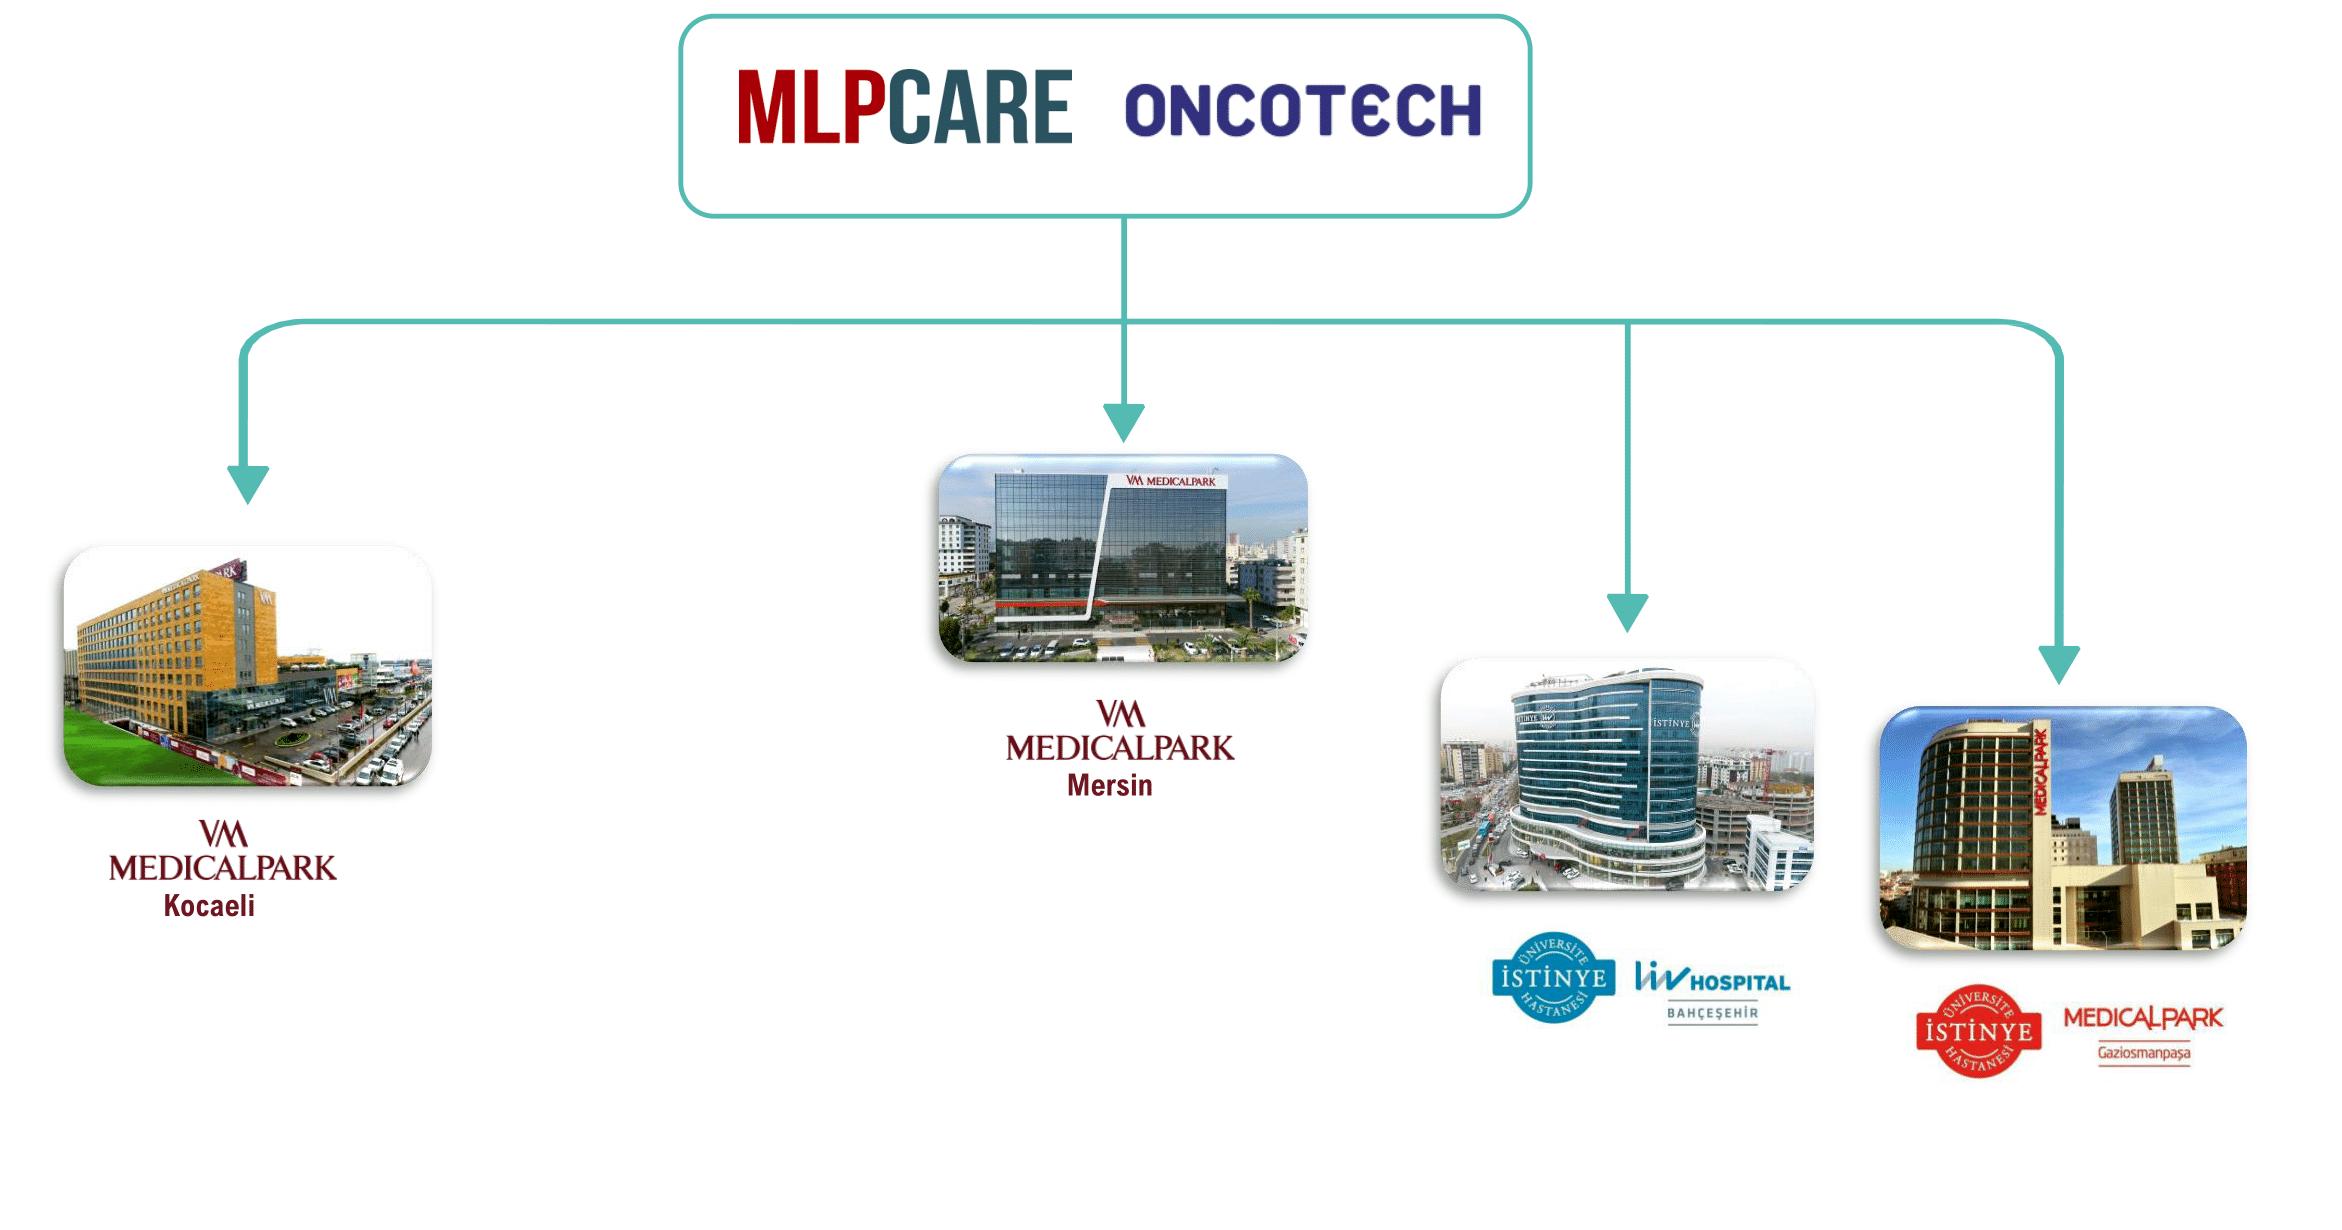 oncotech-contents-pfi